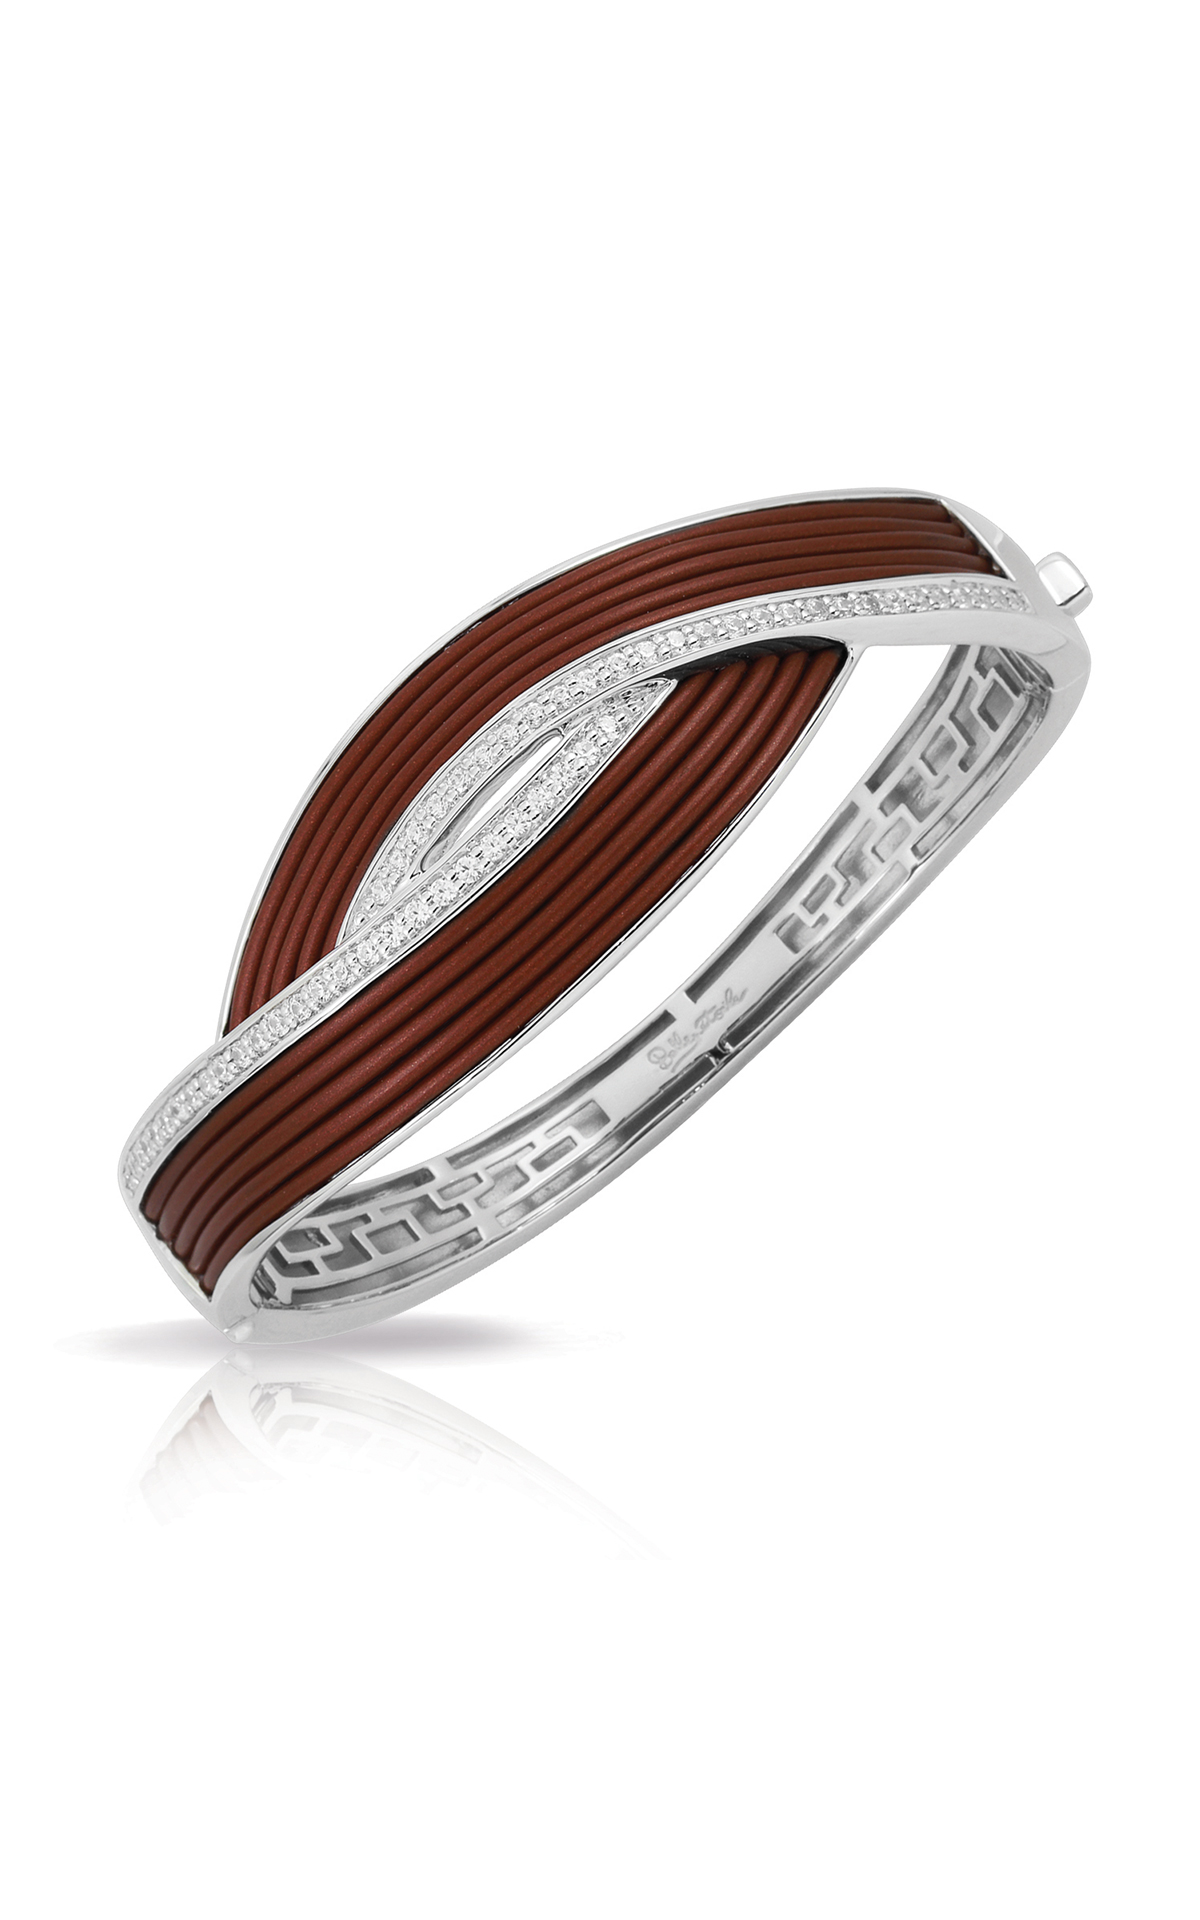 Belle Etoile Eterno Bracelet 07051220502-L product image